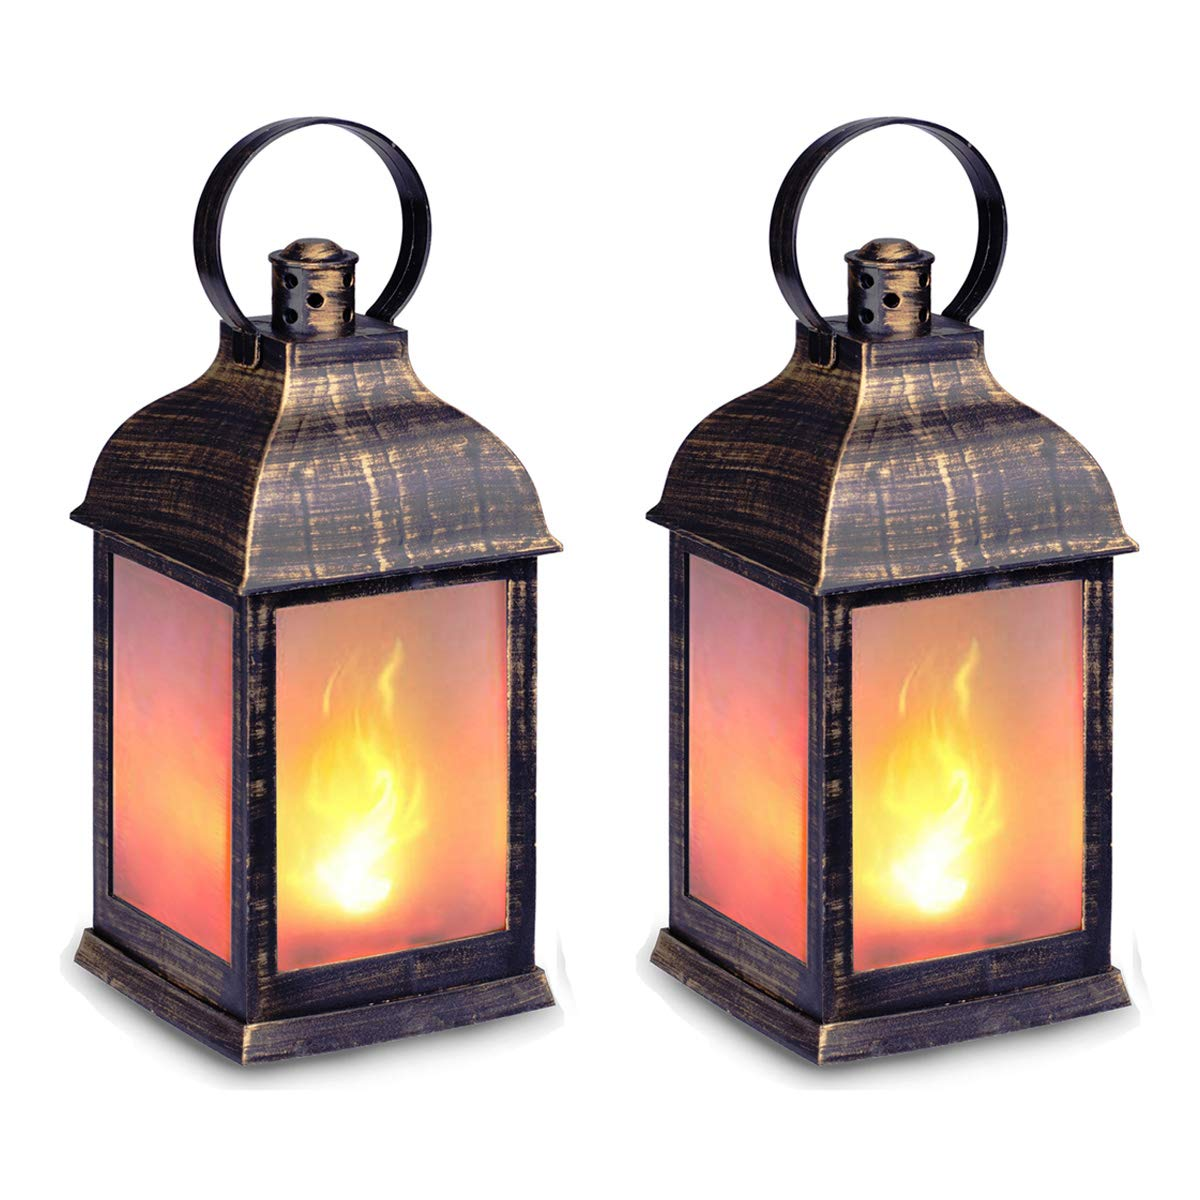 GM 11216 Metal Flame Decorative Camping Lights